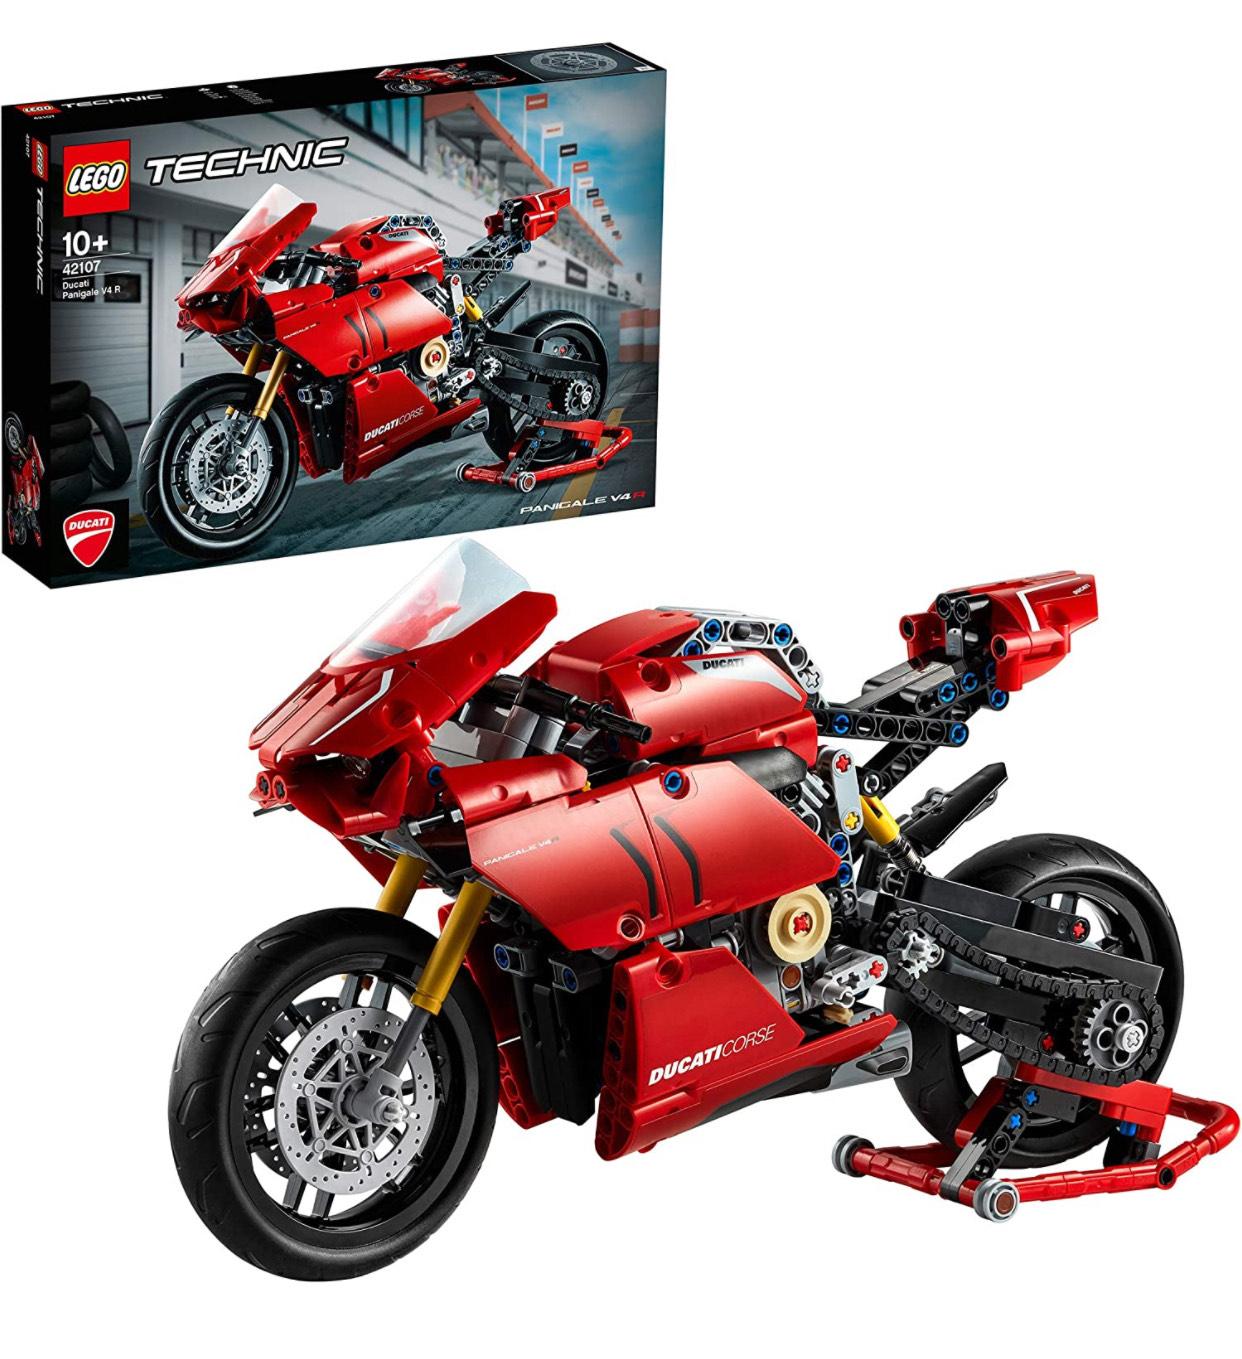 LEGO 42107 Technic Ducati Panigale V4 R Motorbike Model £37.99 At Smyths